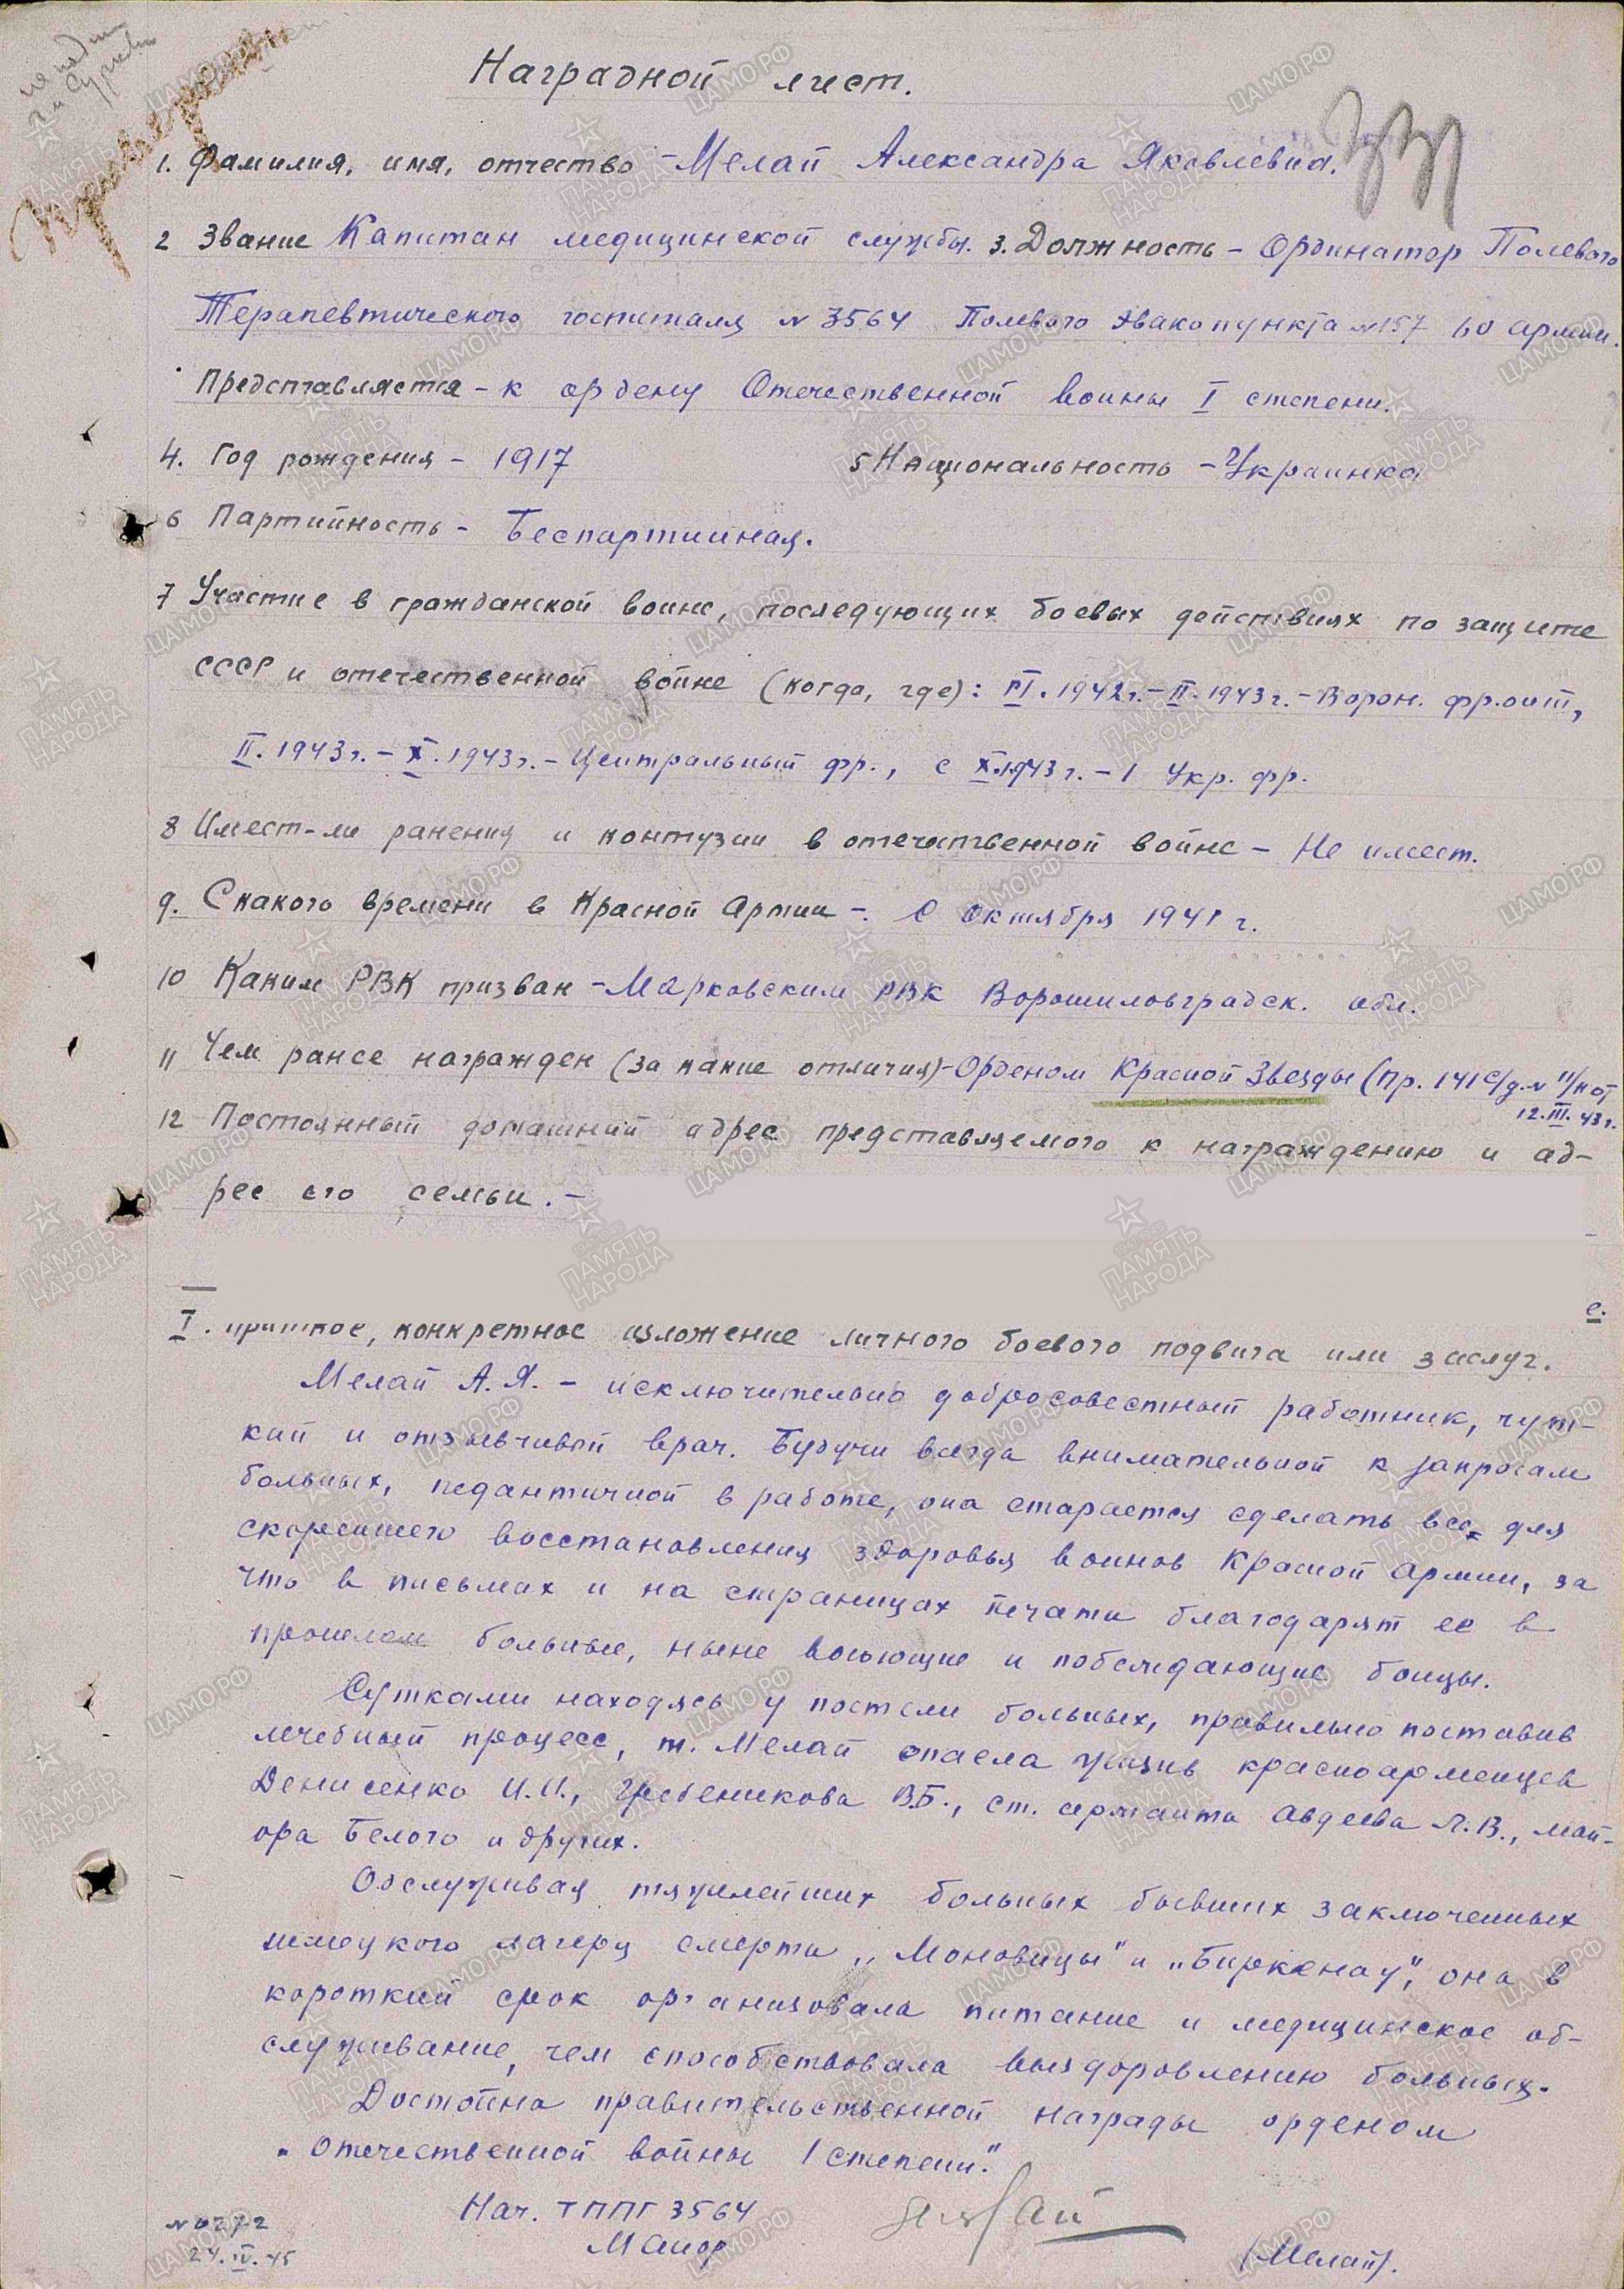 Мелай Александра Яковлевна